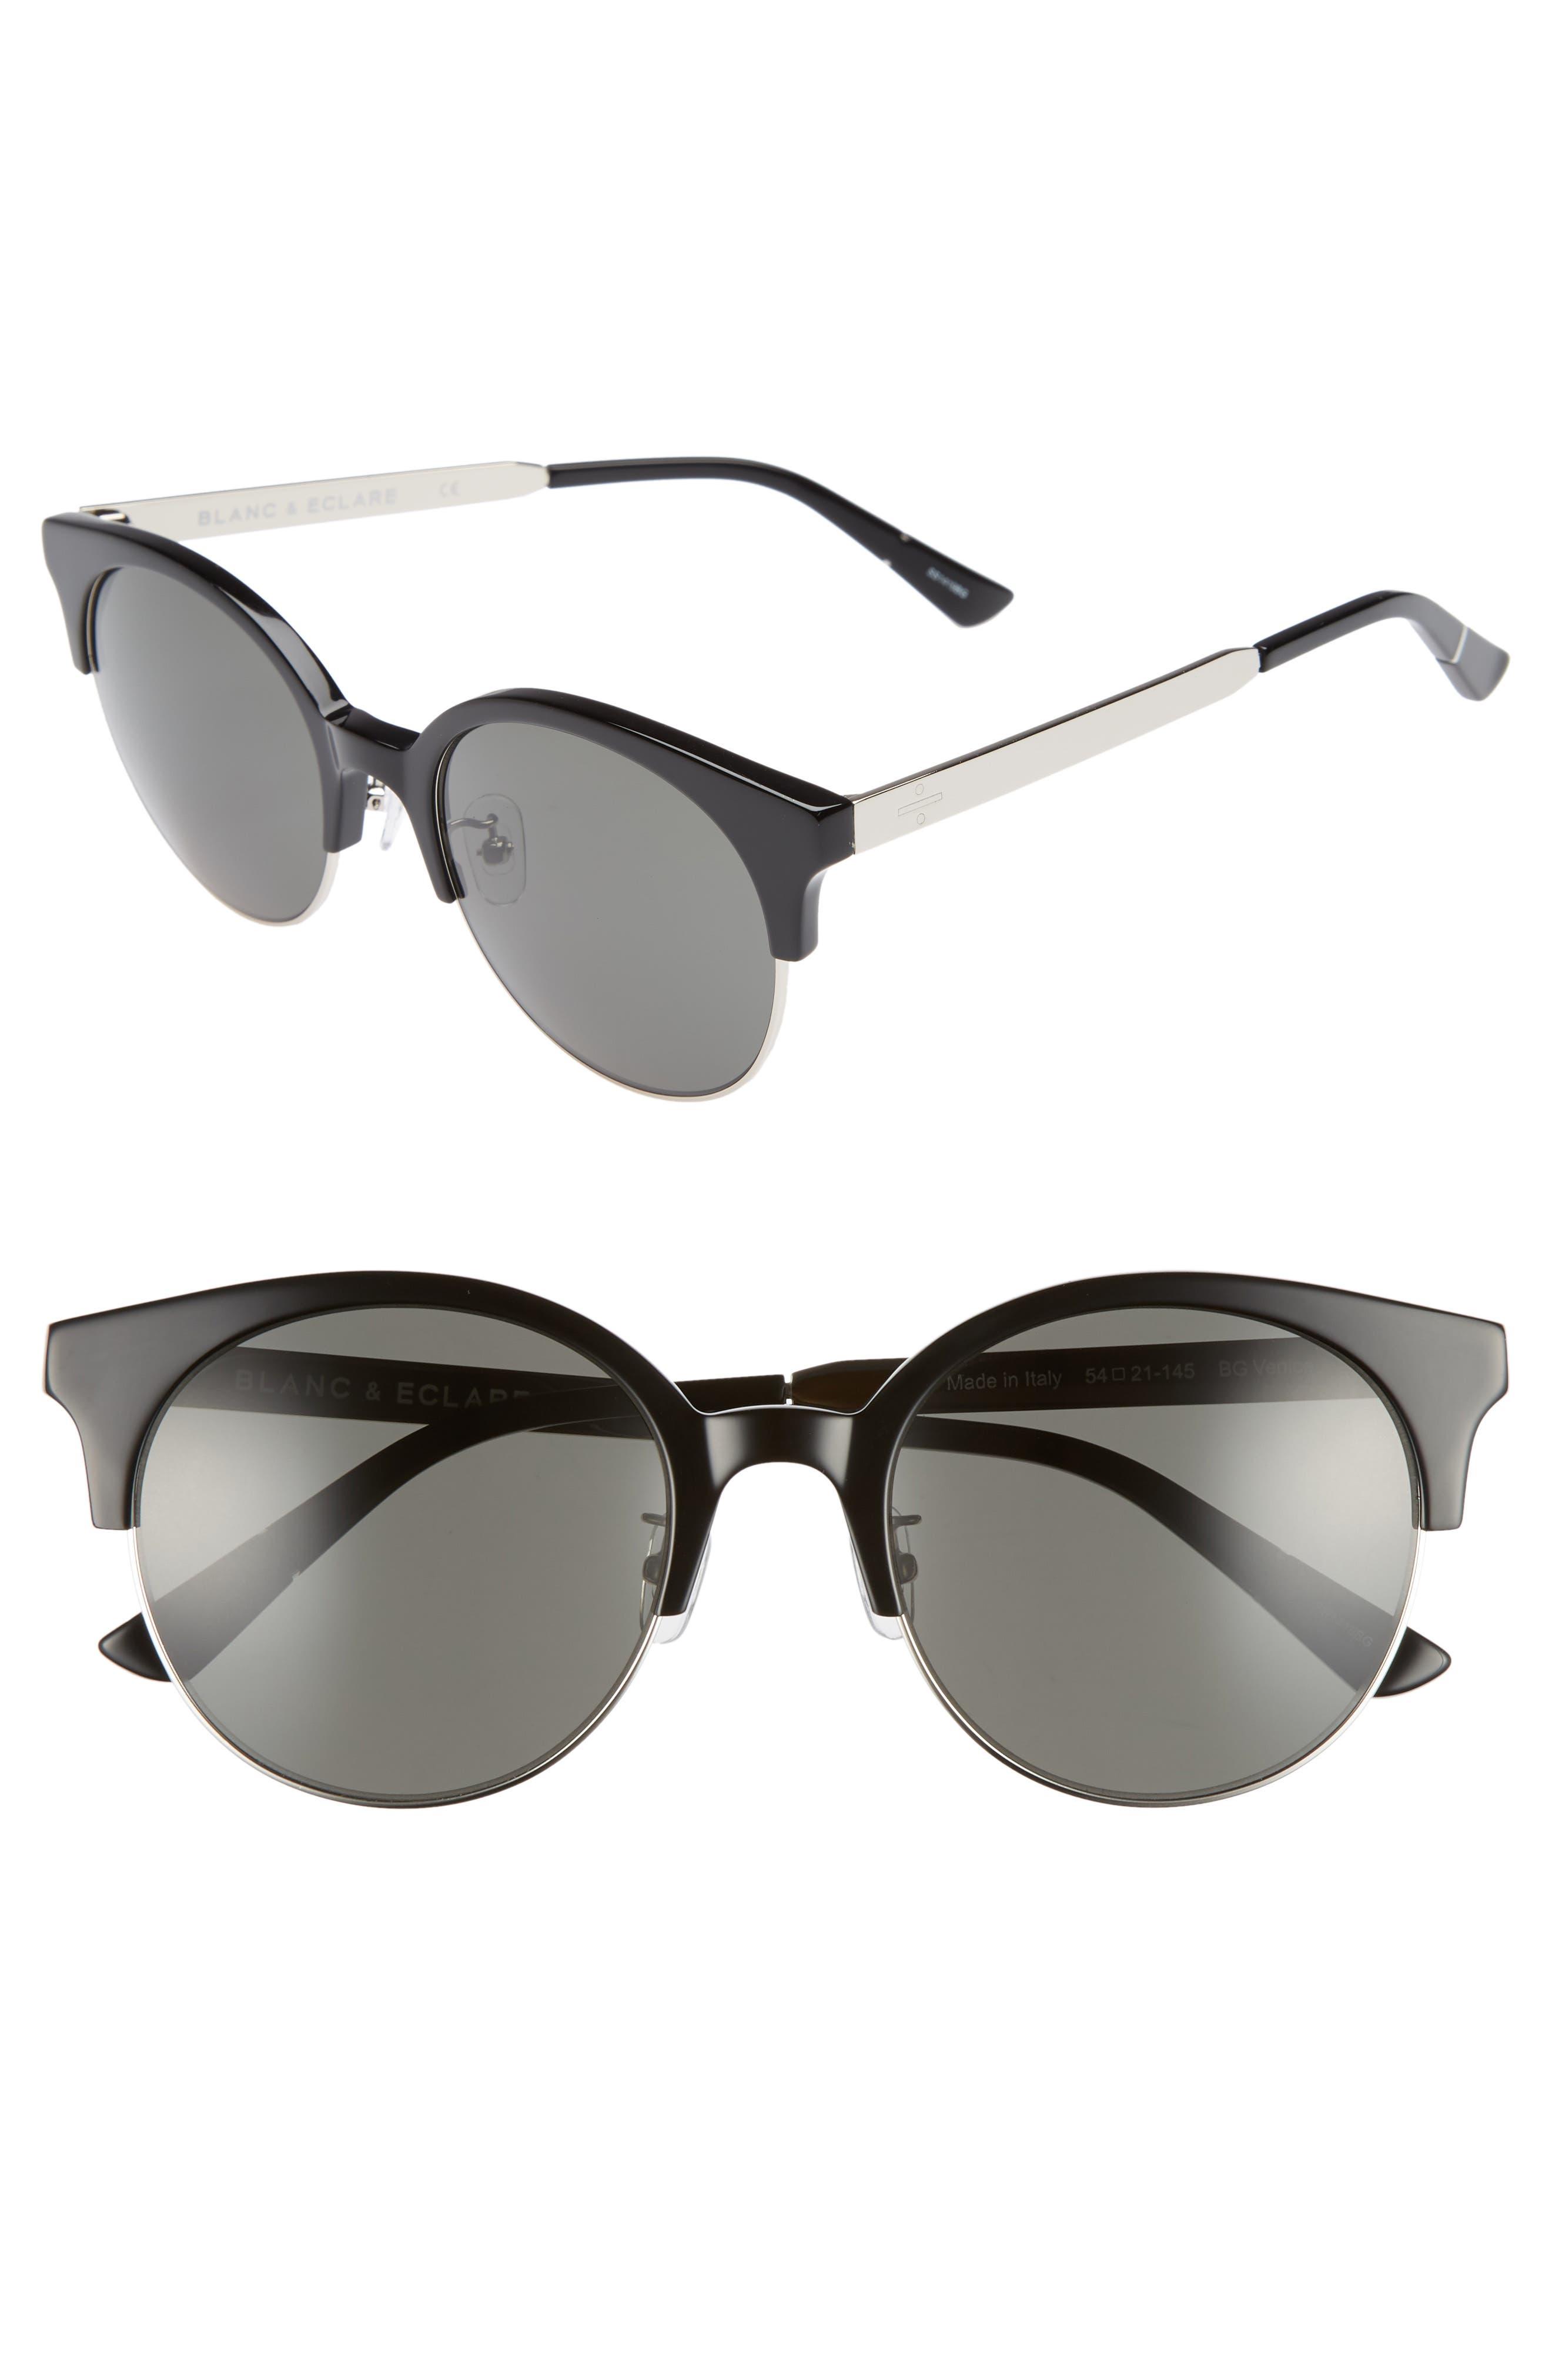 BLANC & ECLARE Venice Round Sunglasses,                             Main thumbnail 1, color,                             001